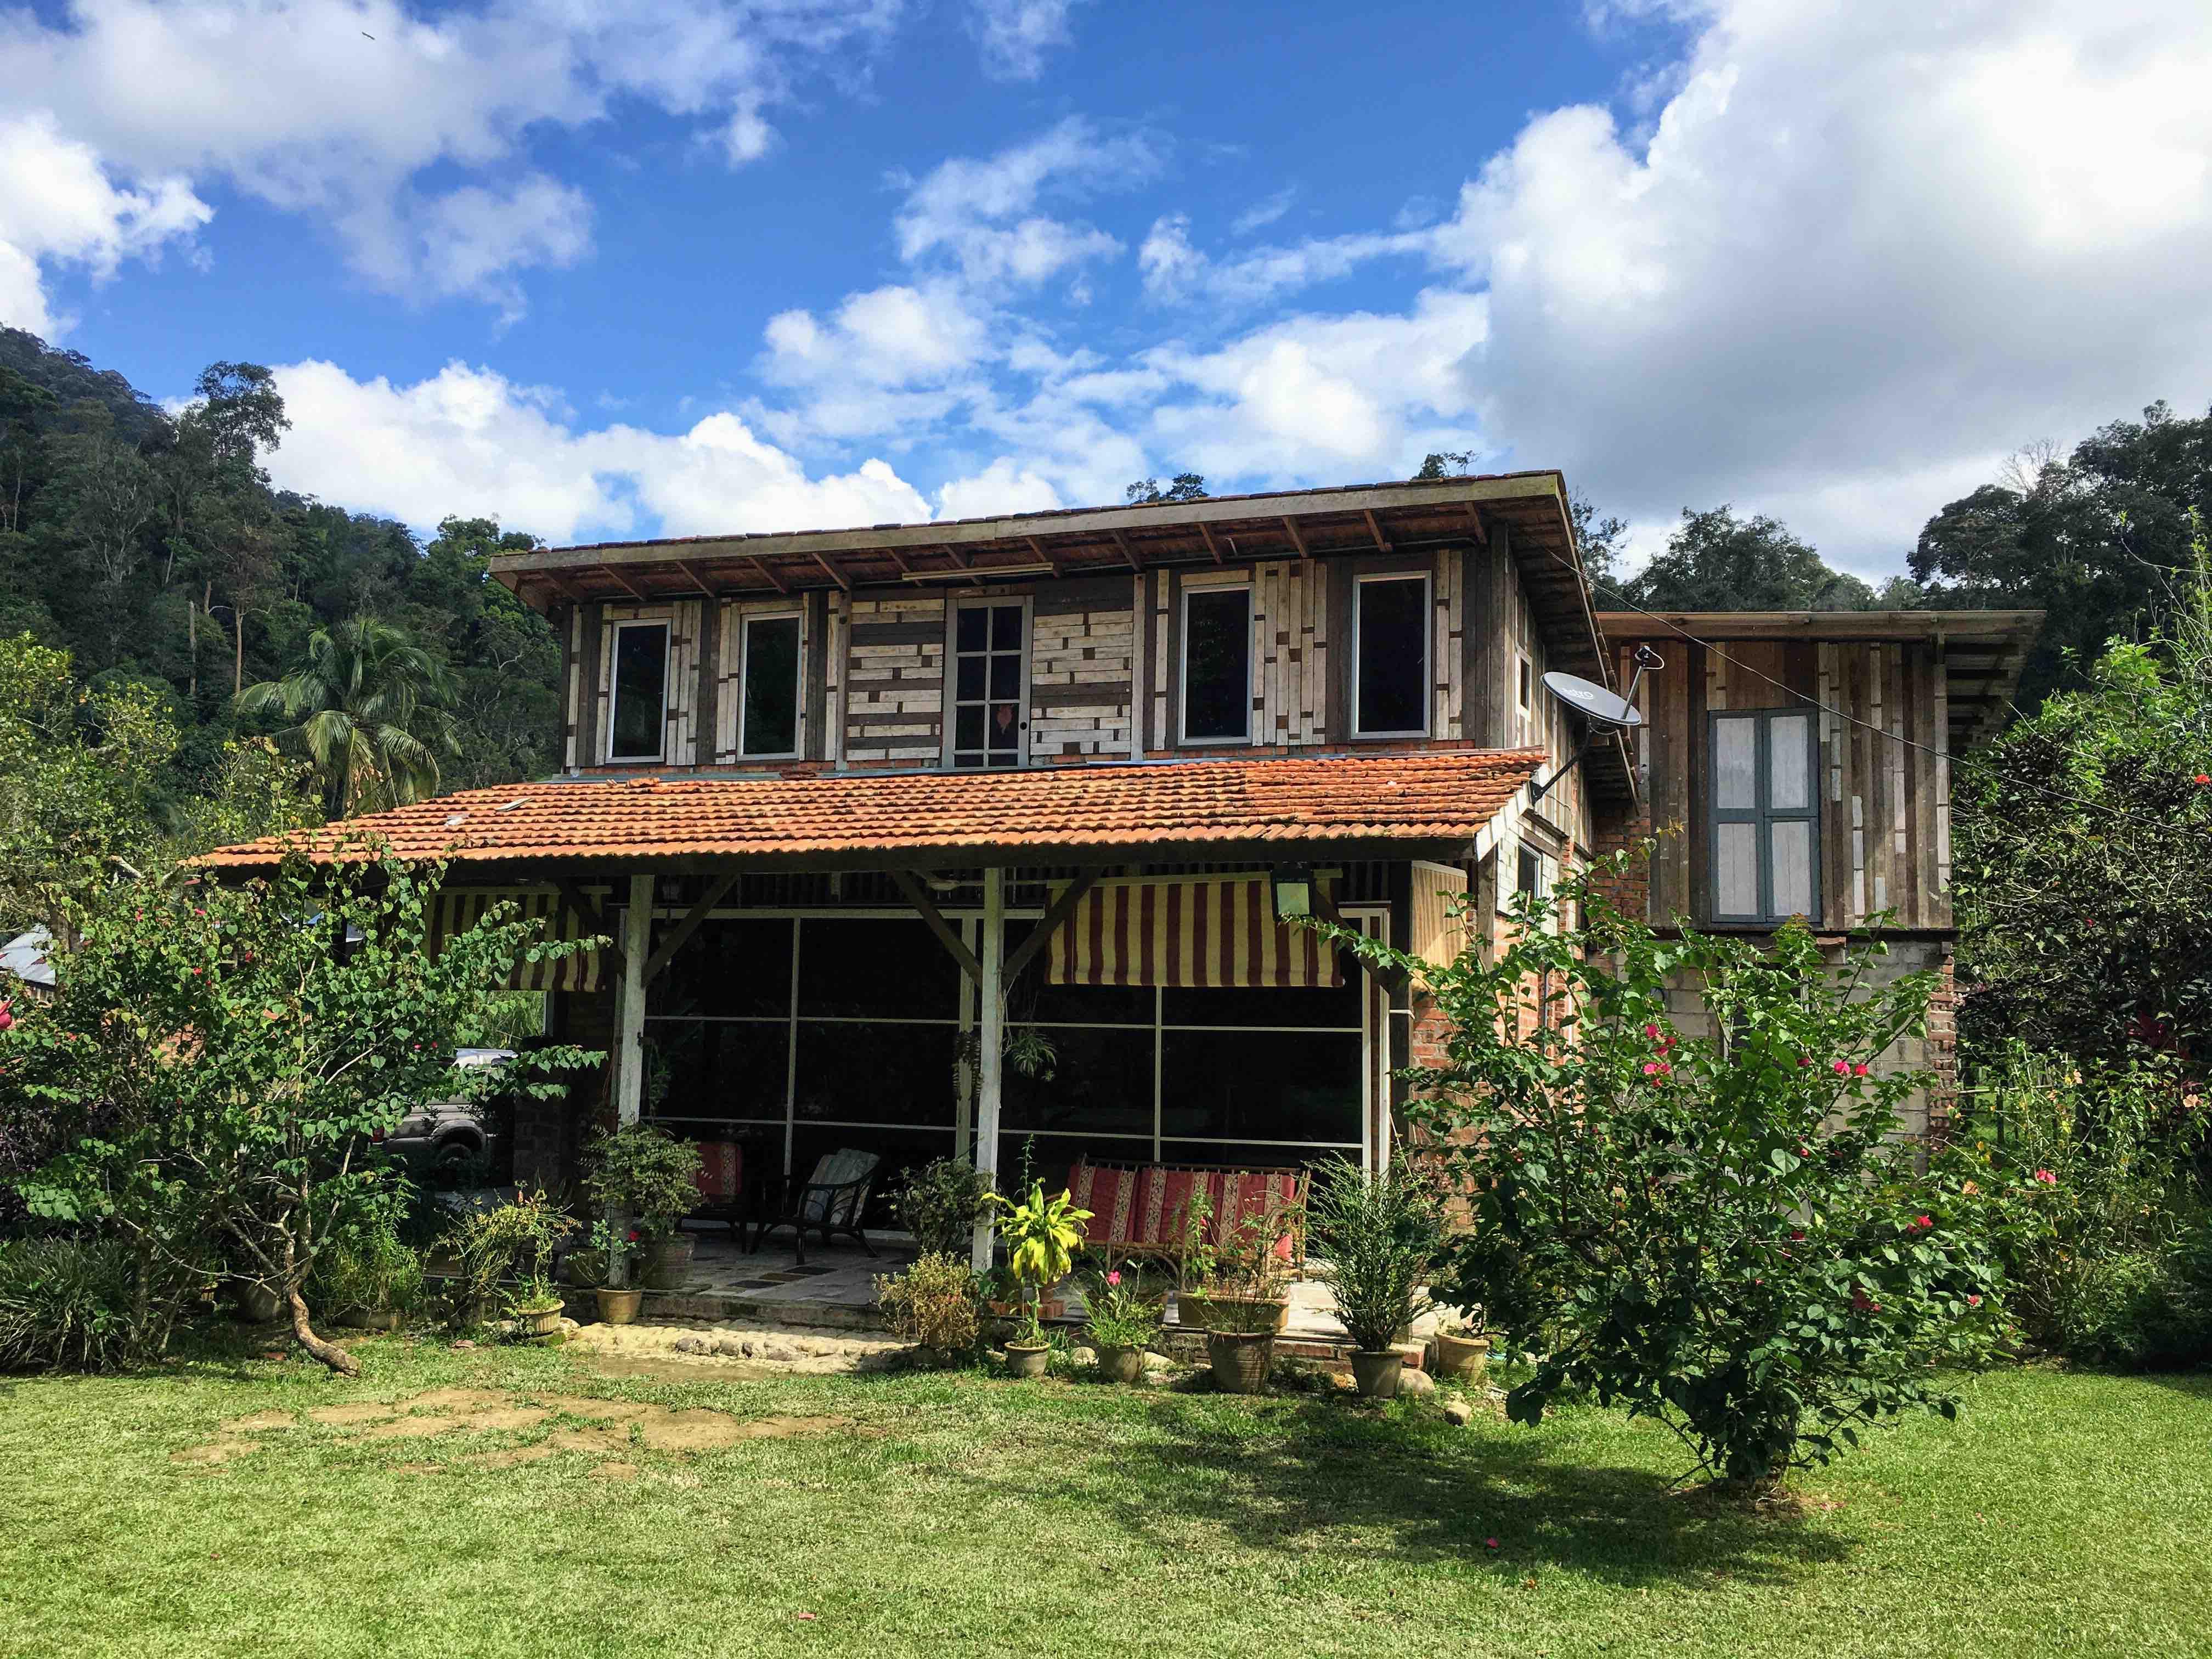 The Nurin Cottage Your Fully Furnished Homestay Kotej Untuk Disewa Di Janda Baik Bentong Pahang Malaysia